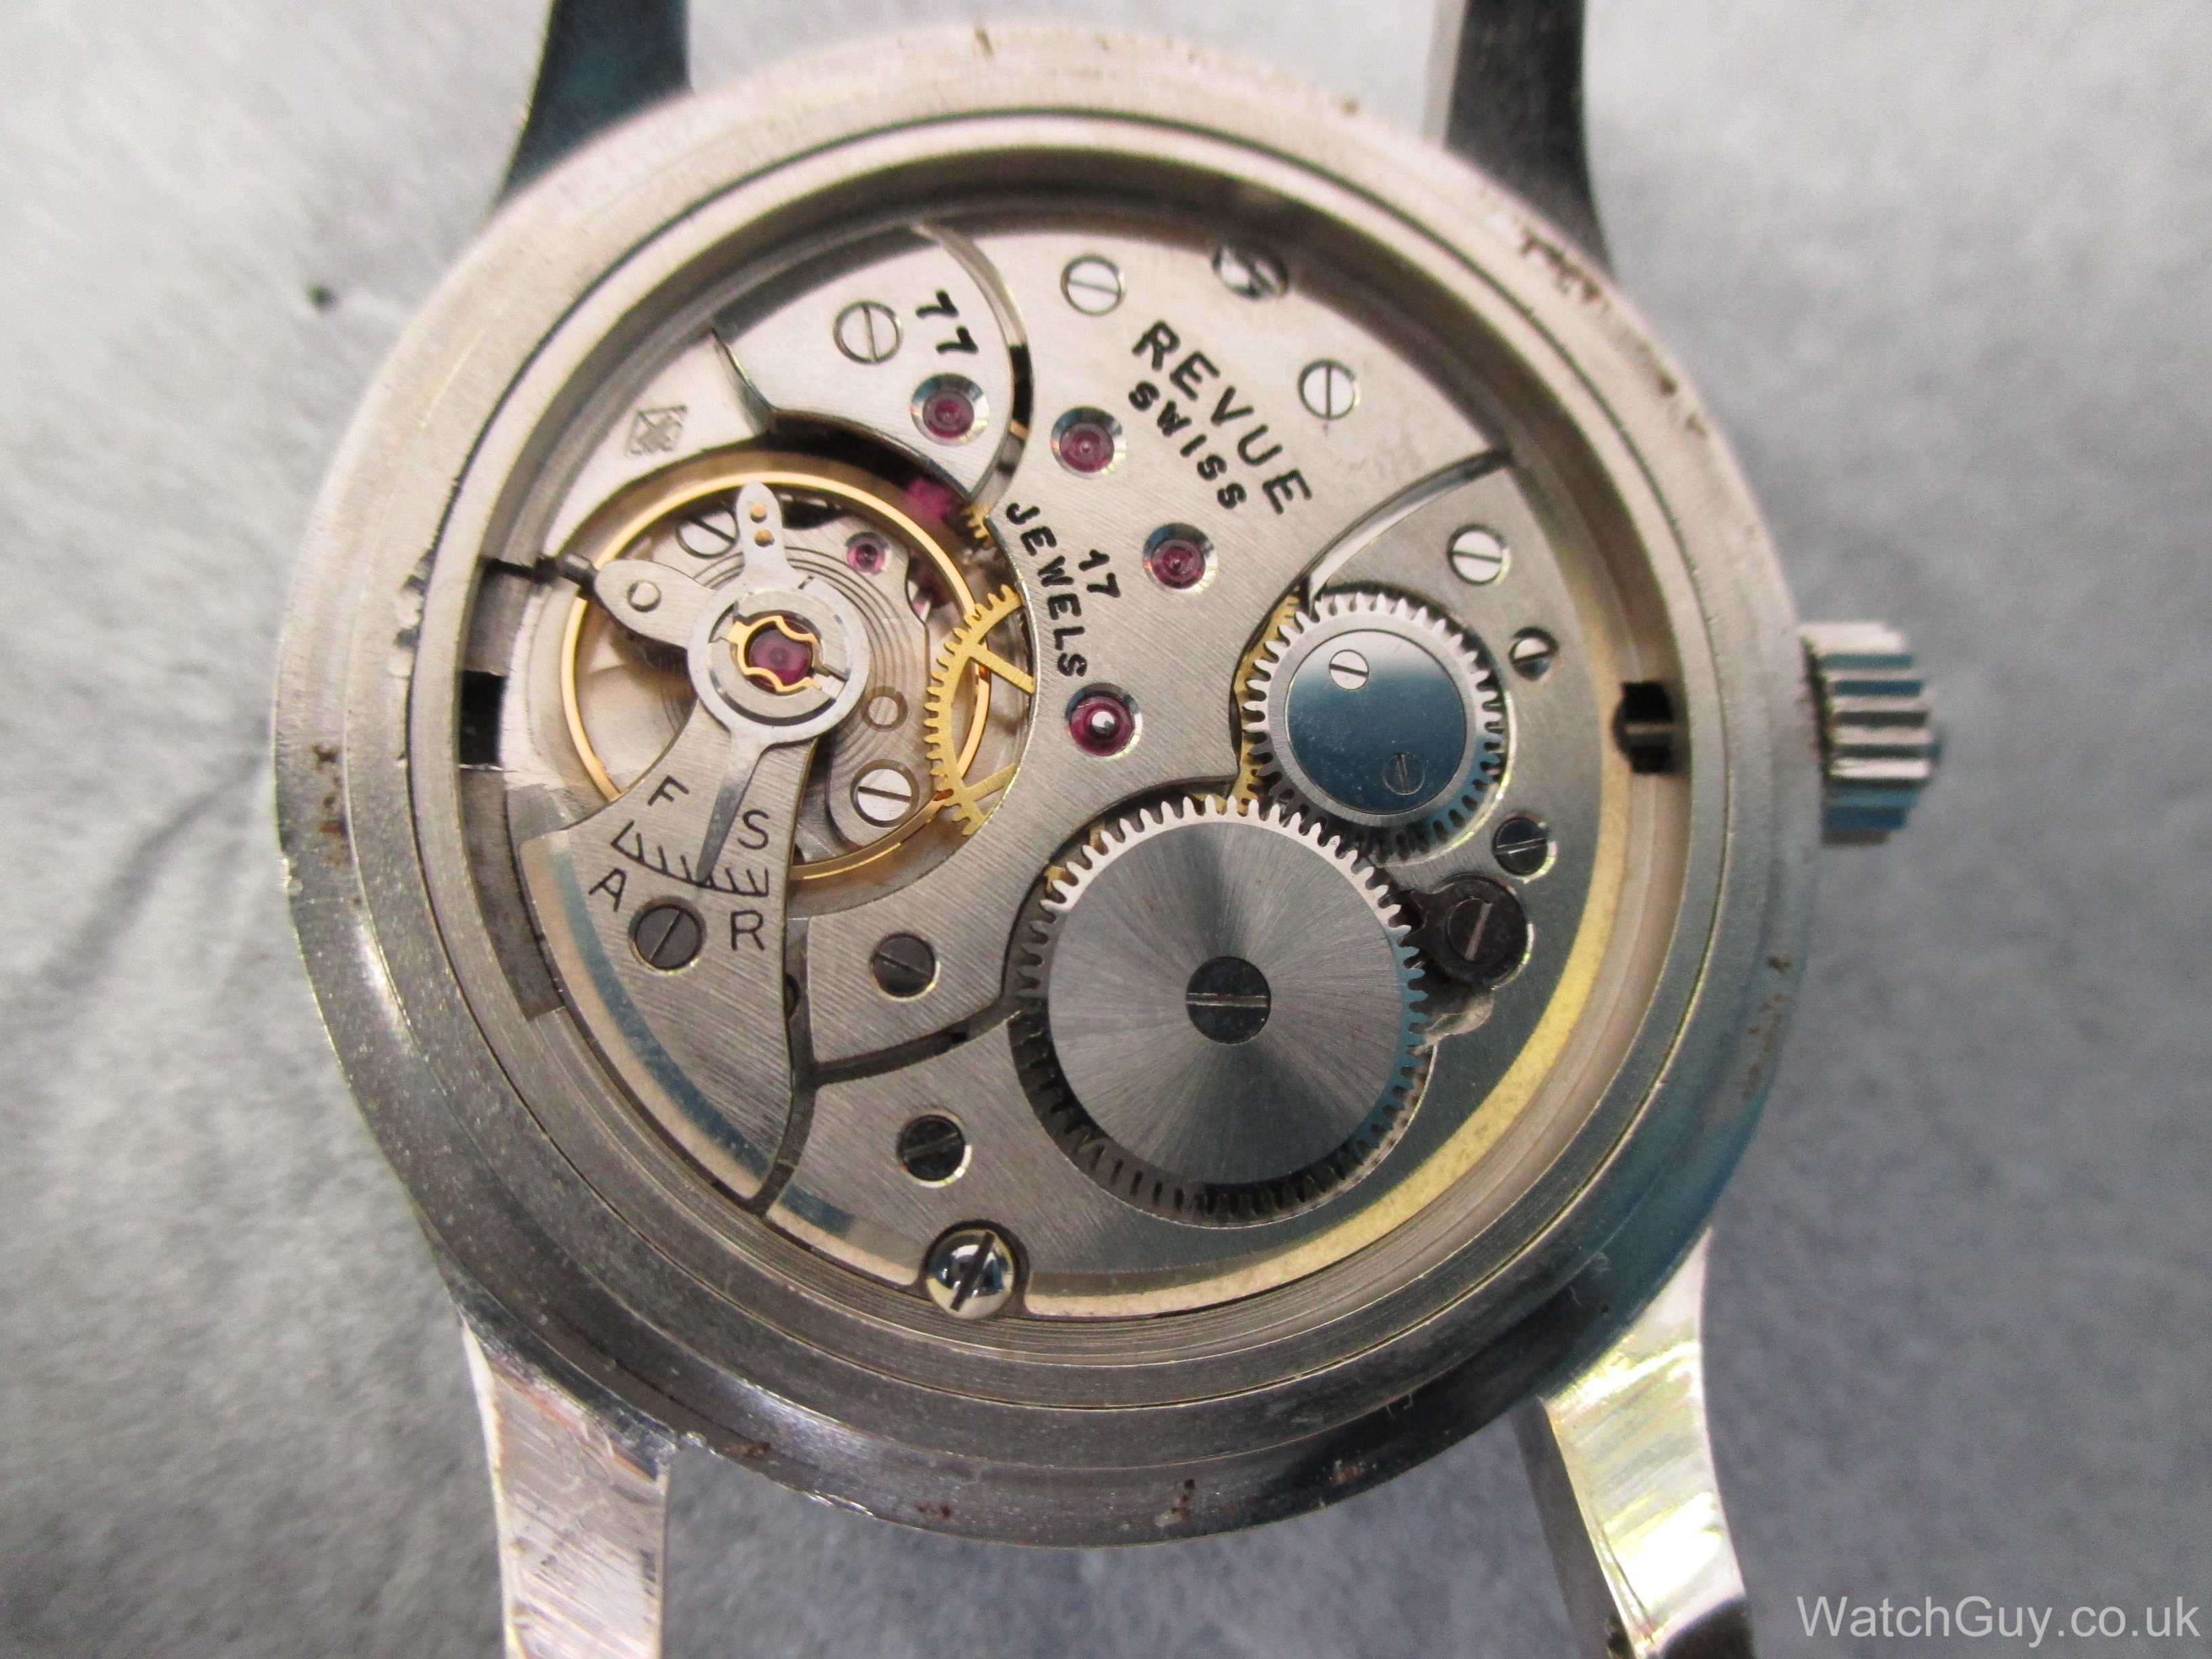 titanium for edition watch the bradleyxkbt blinds blind unisex br front eone special com watches x bradley kbt watchshop